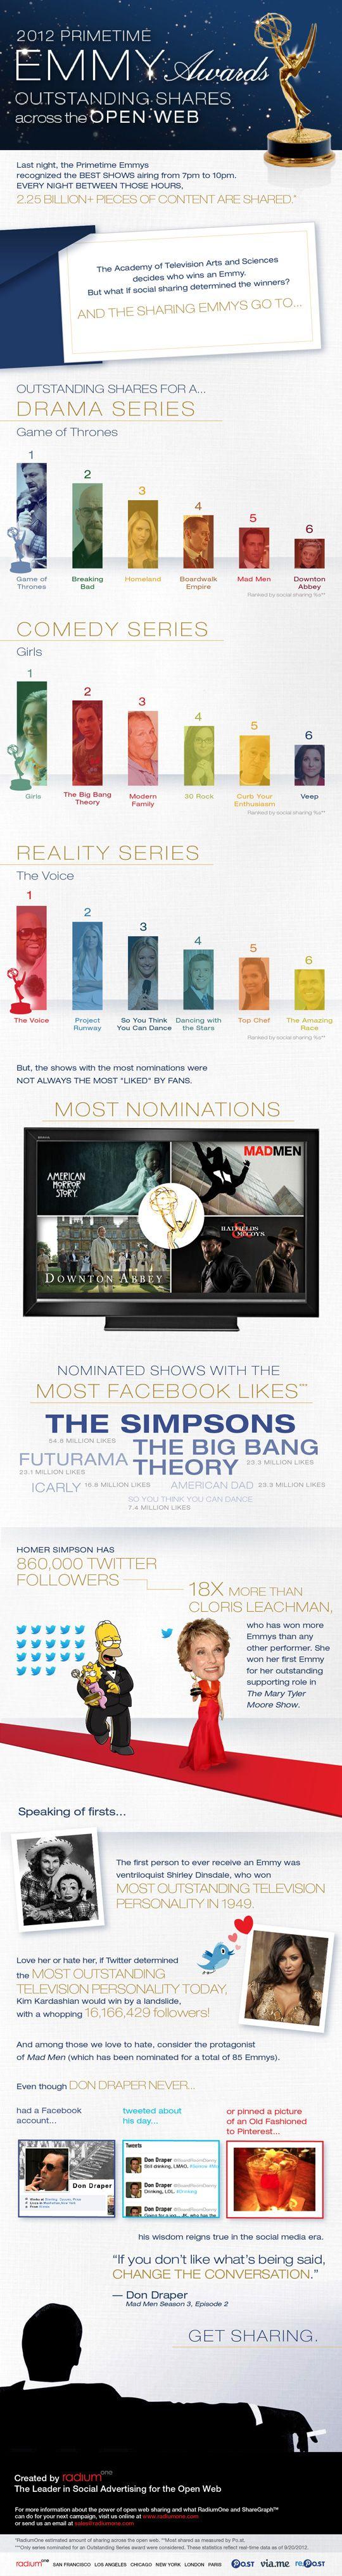 If Social Sharing Determined Emmy Winners [INFOGRAPHIC]: Sharing Determined, 2012 Emmy, Winners Infographic, Social Media, Emmy Winners, Determined Emmy, Winners Linkedinmarketing